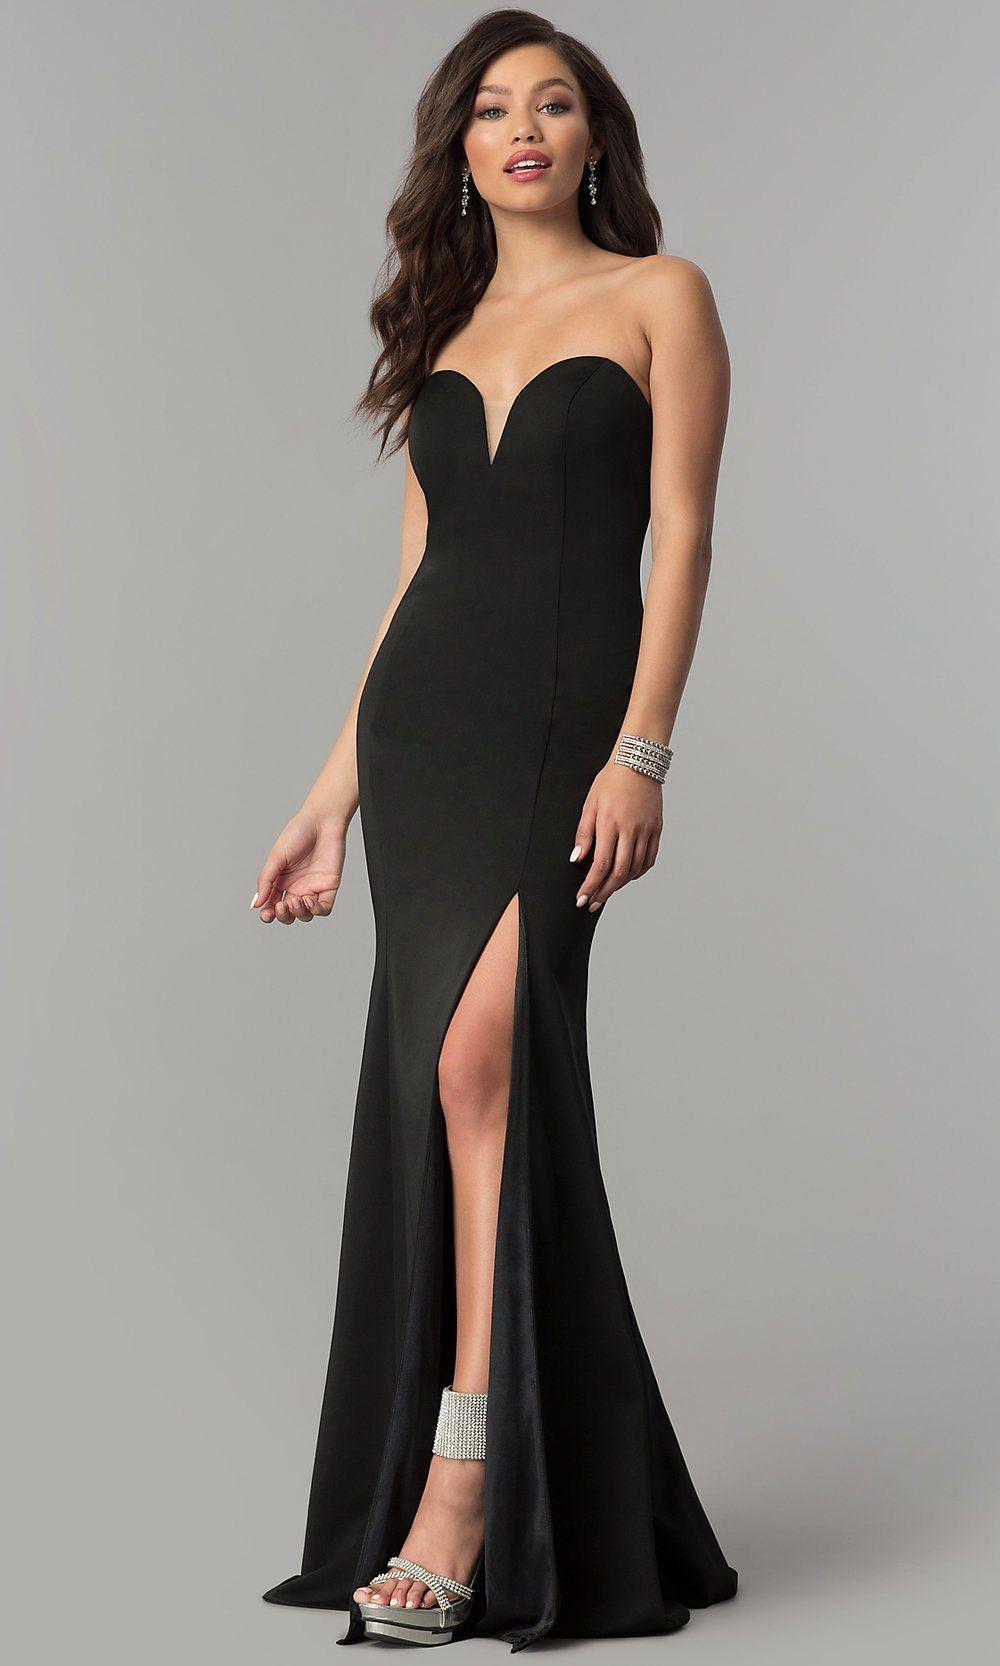 Jvnx By Jovani Long Strapless Sweetheart Prom Dress Sweetheart Prom Dress Open Back Prom Dresses Designer Formal Dresses [ 1666 x 1000 Pixel ]